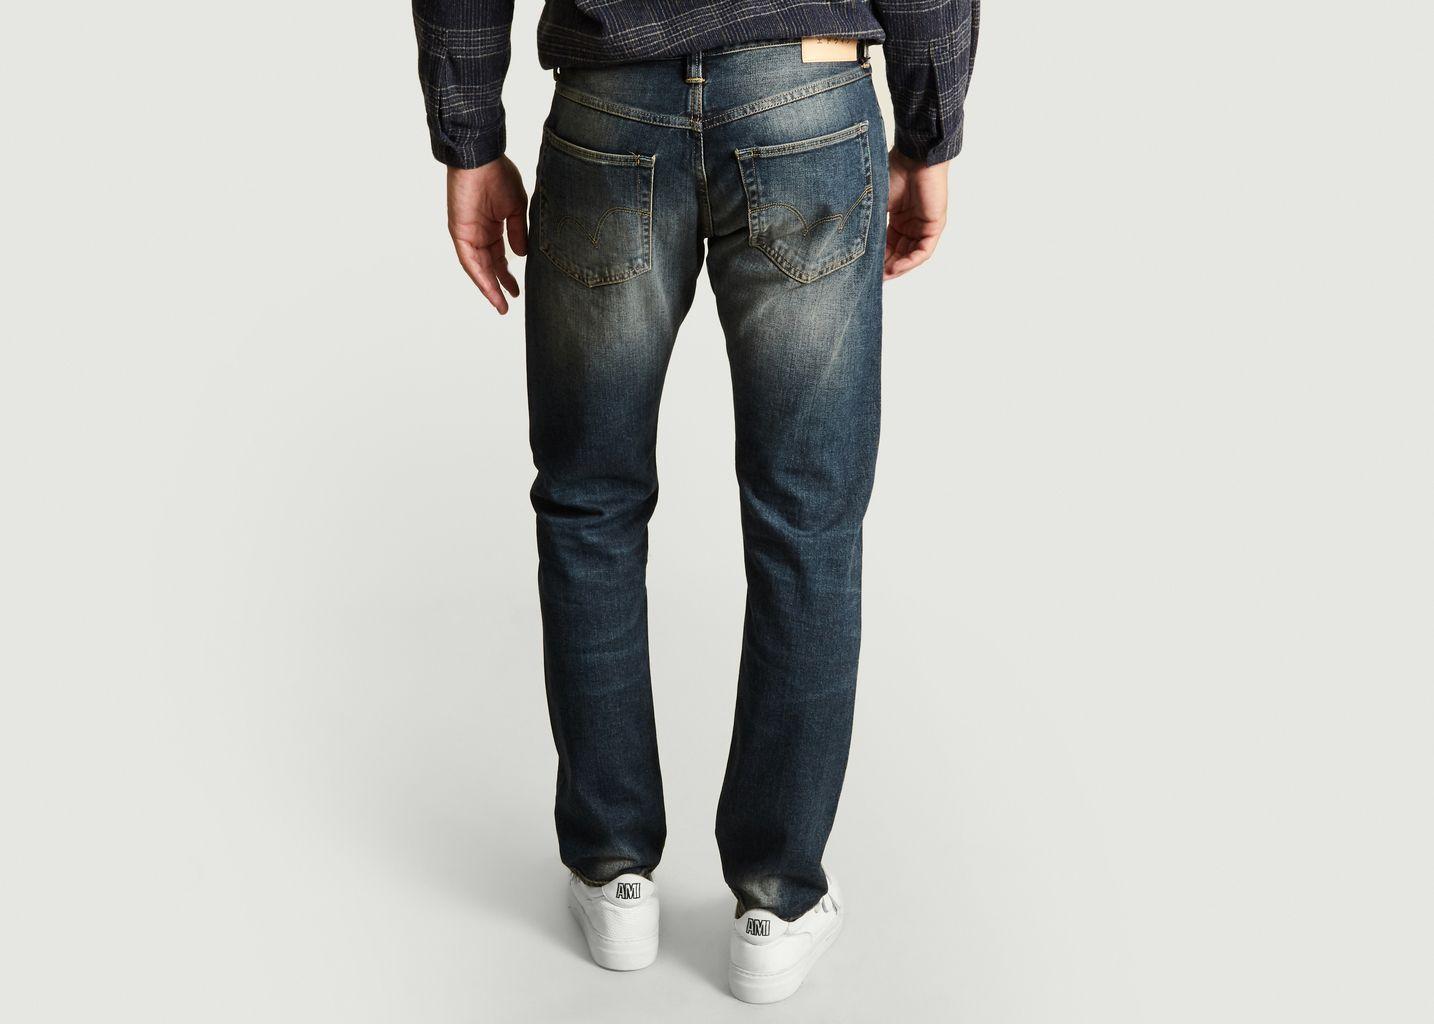 ED-55 Regular Tapered Jeans - Edwin